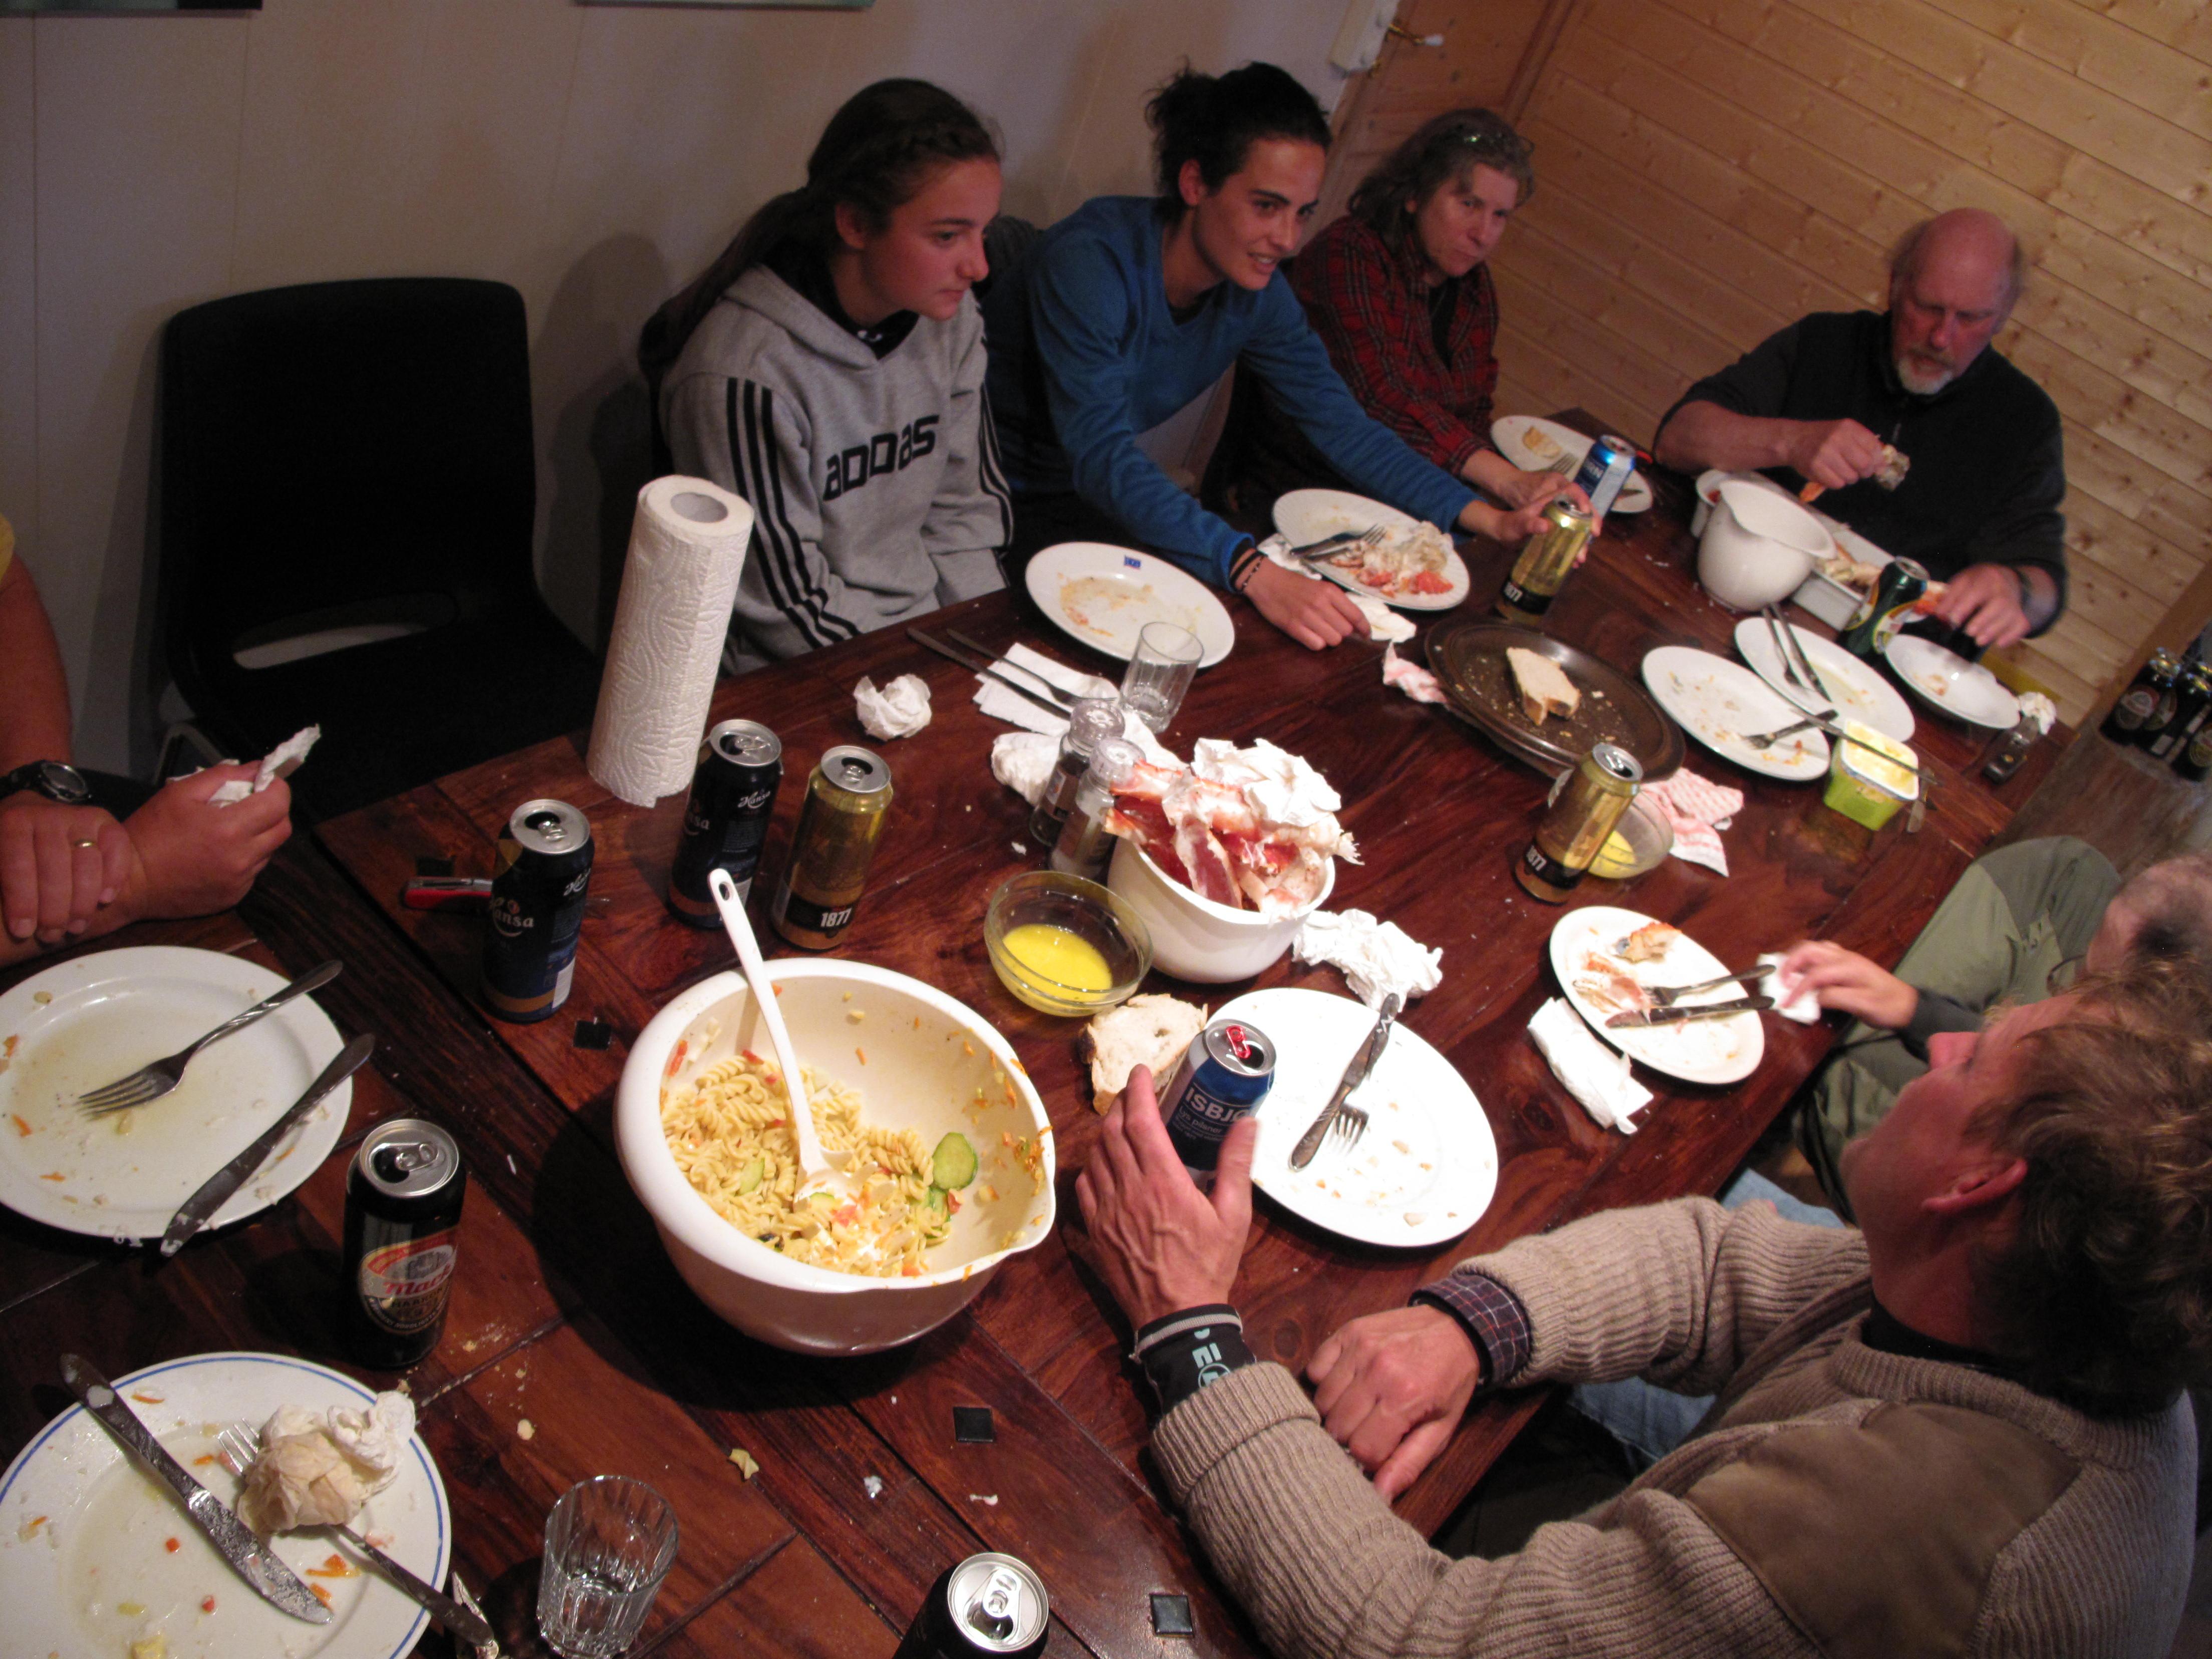 The aftermath of the Kongekrabbe feast